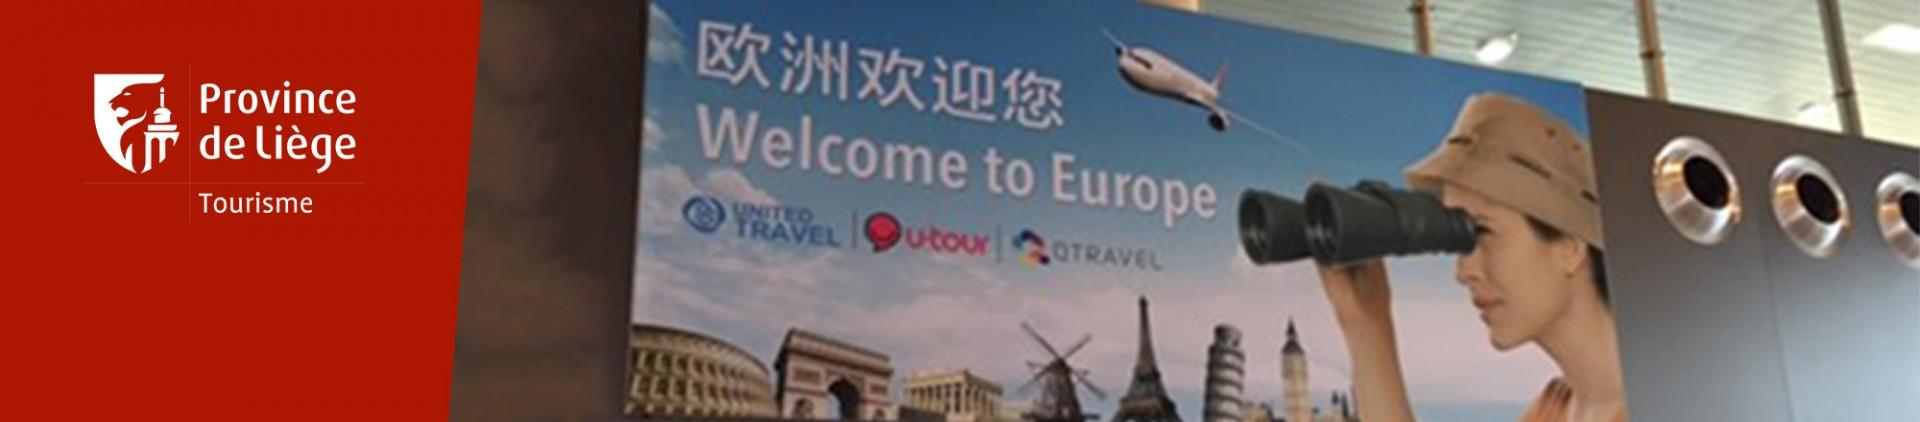 Welcome China - Liège province